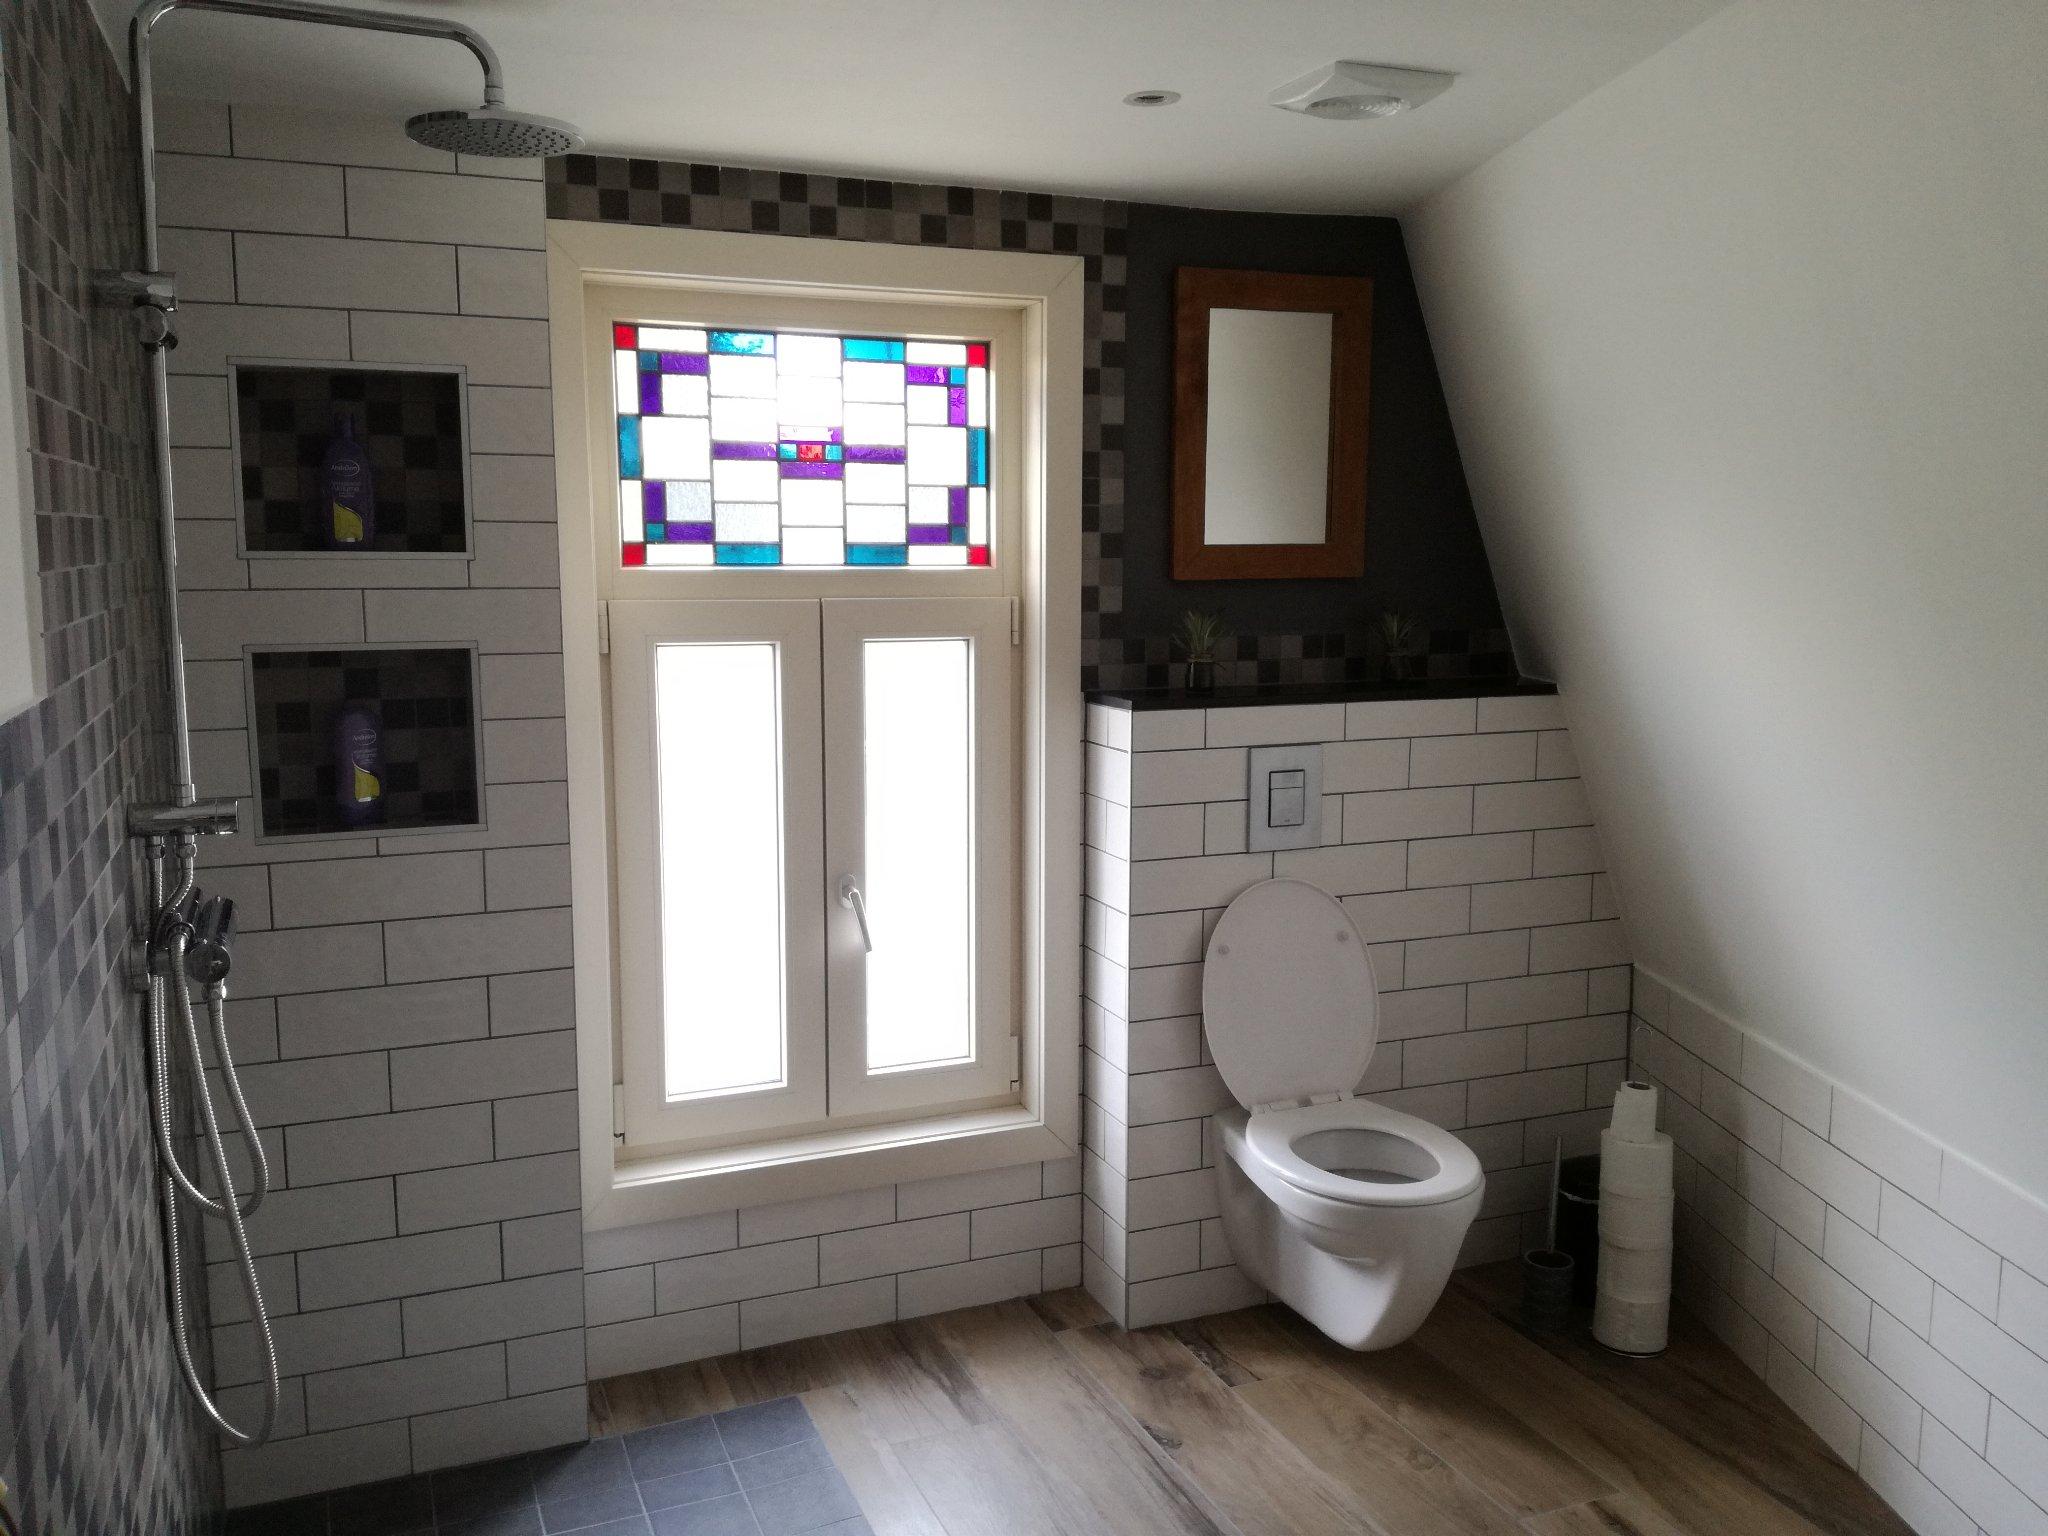 Vloerverwarming Badkamer Aanleggen : Tegelen vloer en electrische vloerverwarming aanleggen in badkamer